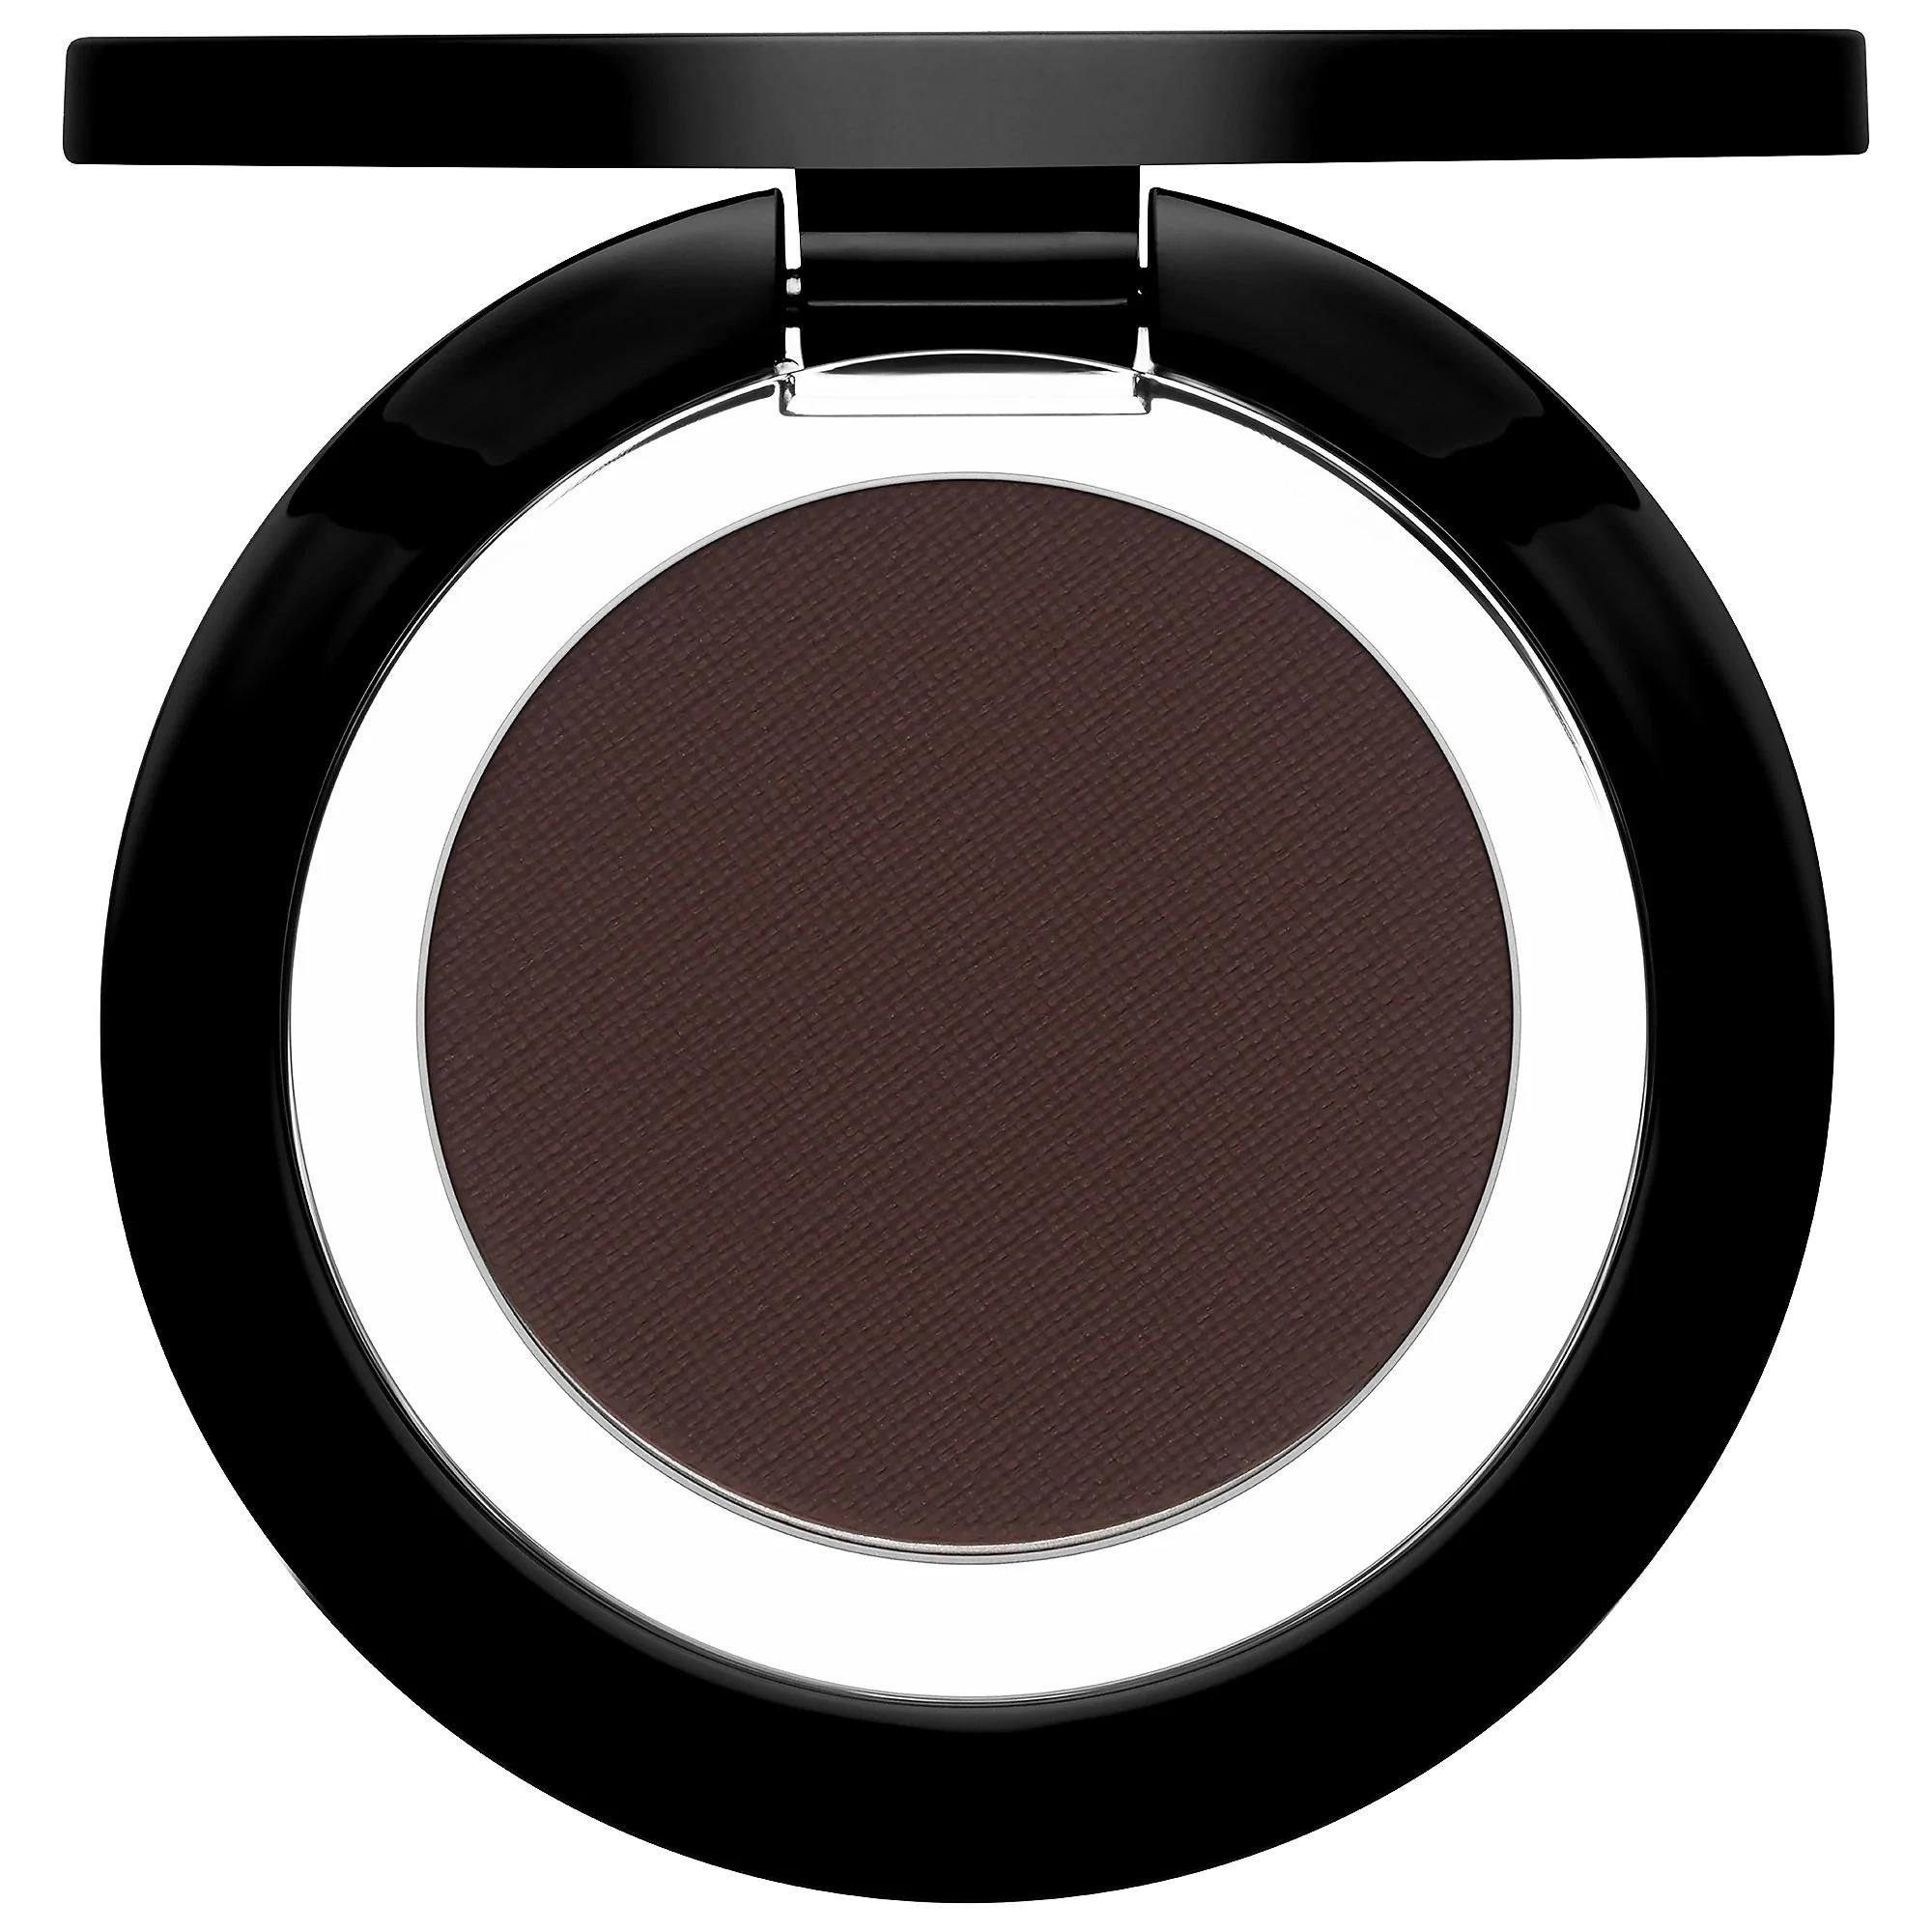 Pat McGrath Labs EYEdols Eyeshadow Deep Velvet